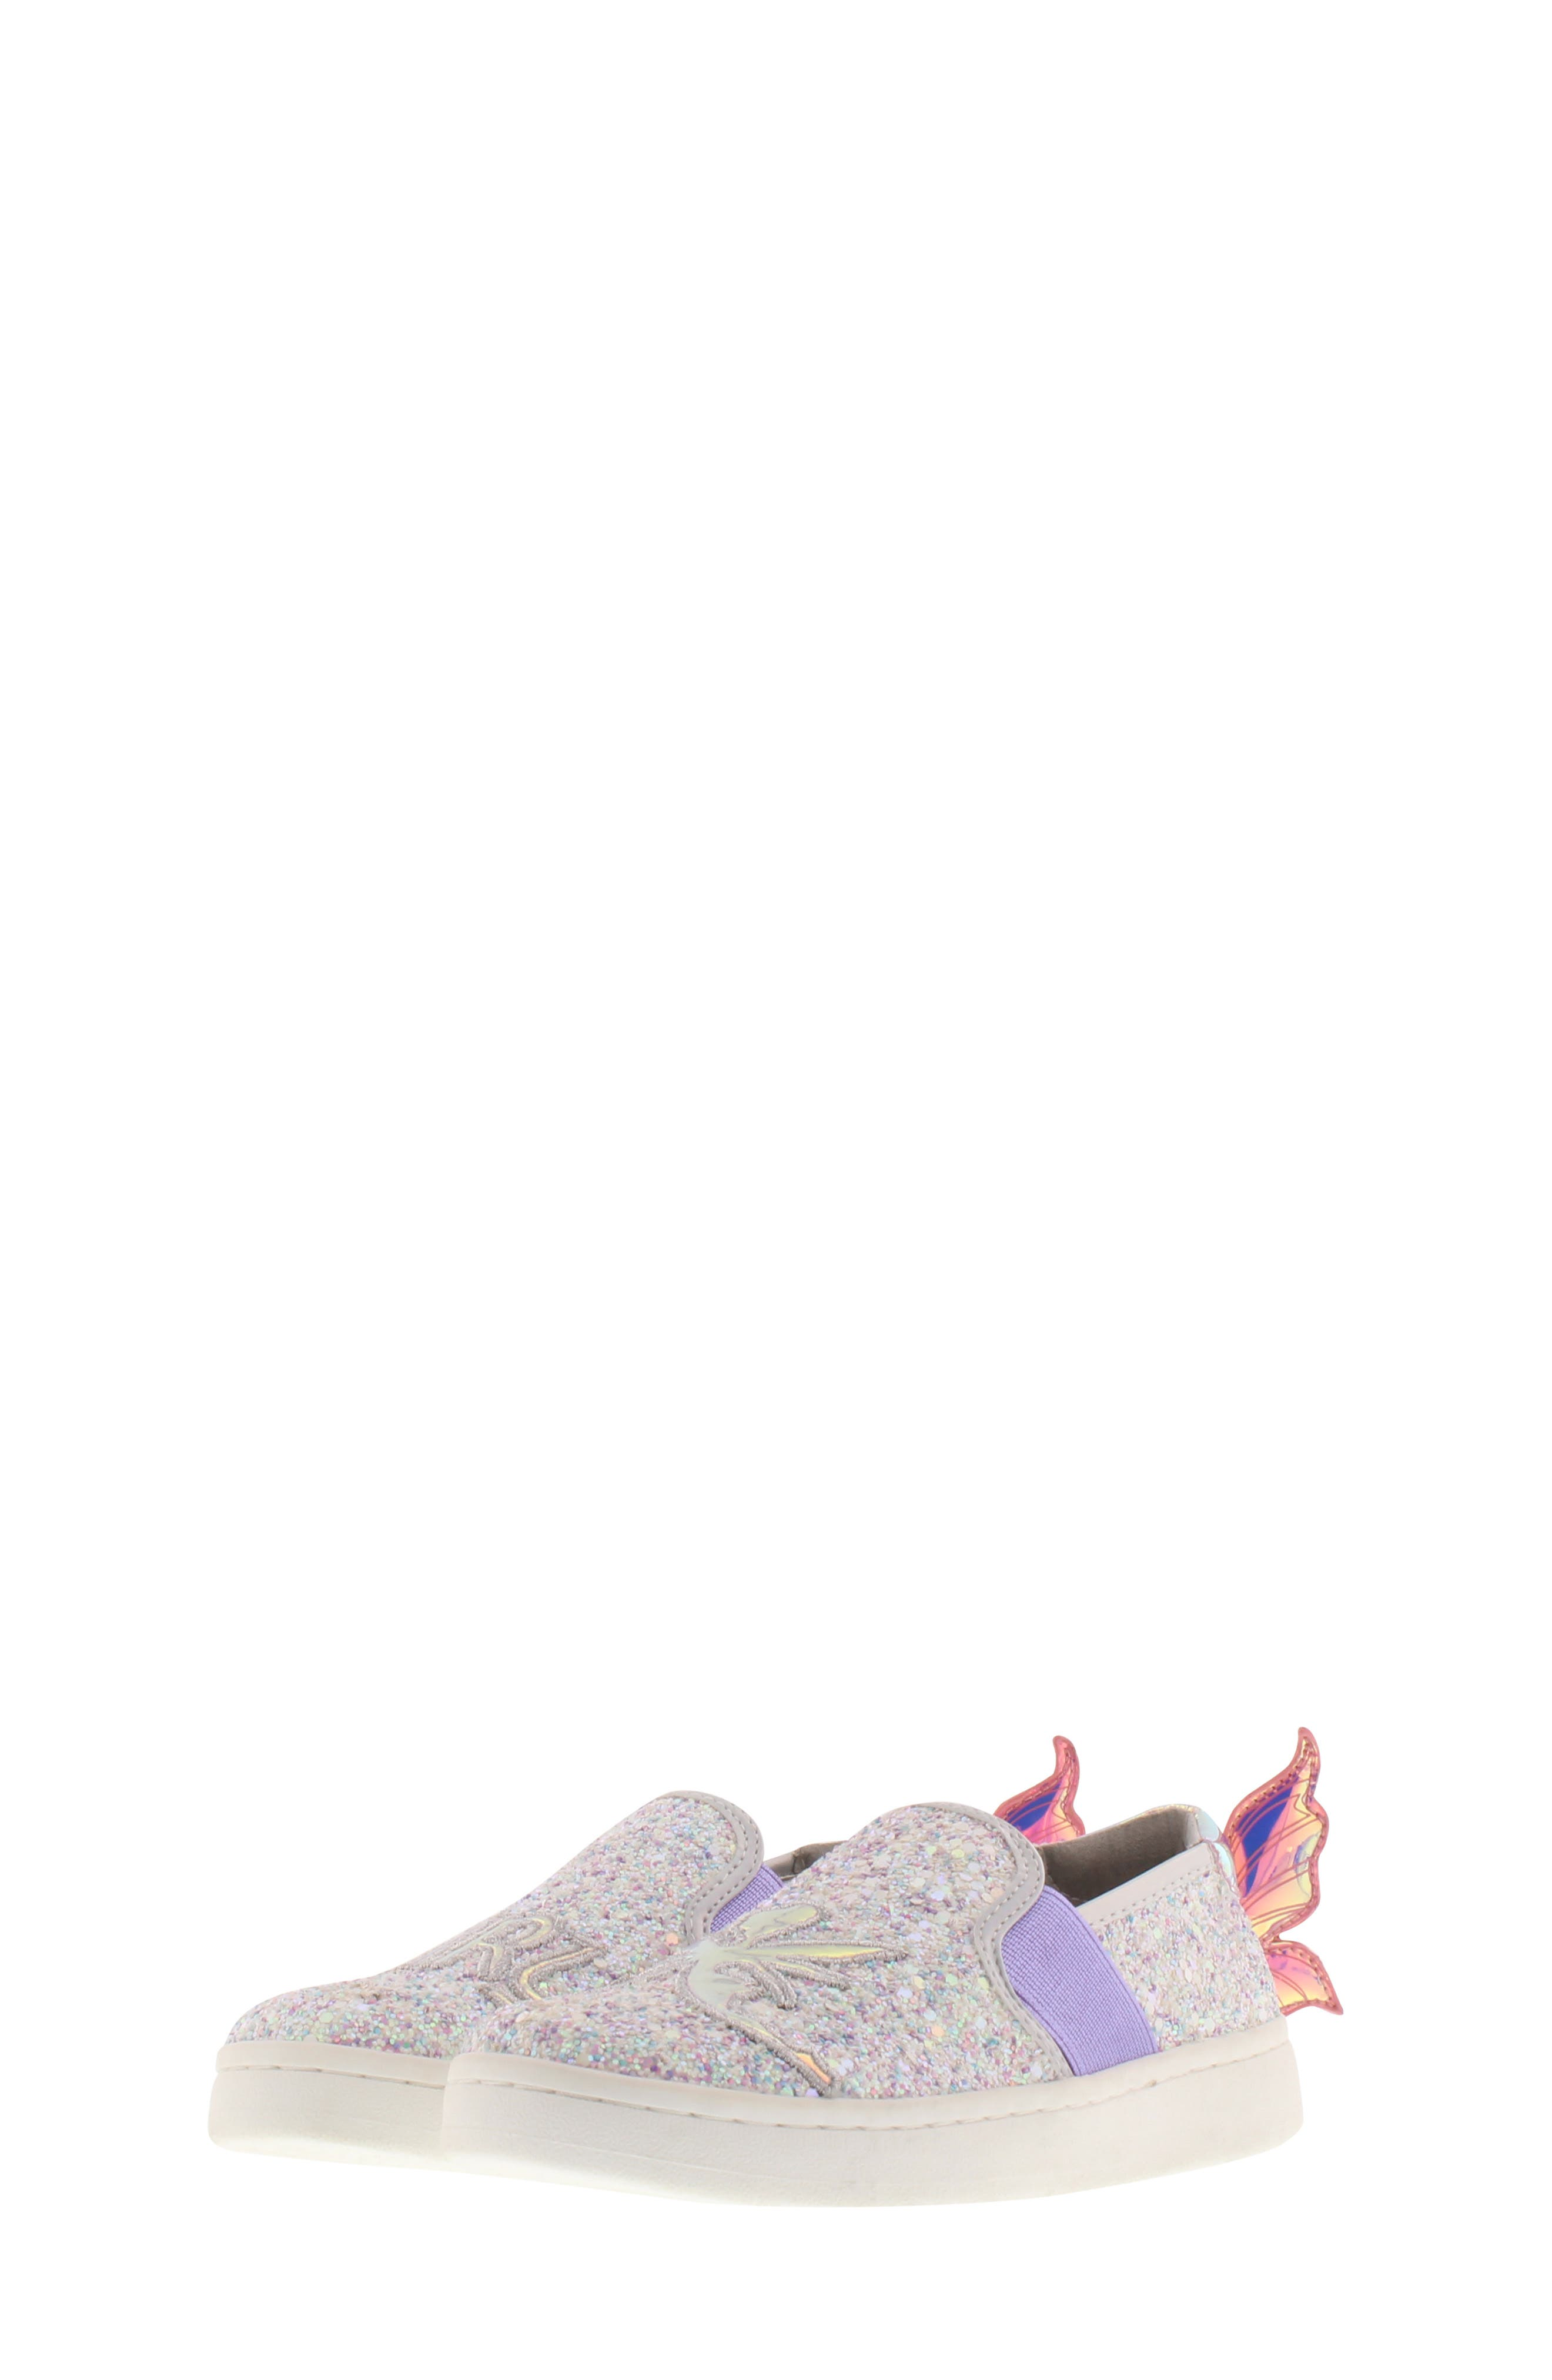 SAM EDELMAN, Blake Lina Fairy Glitter Slip-On Sneaker, Main thumbnail 1, color, PINK/ PURPLE